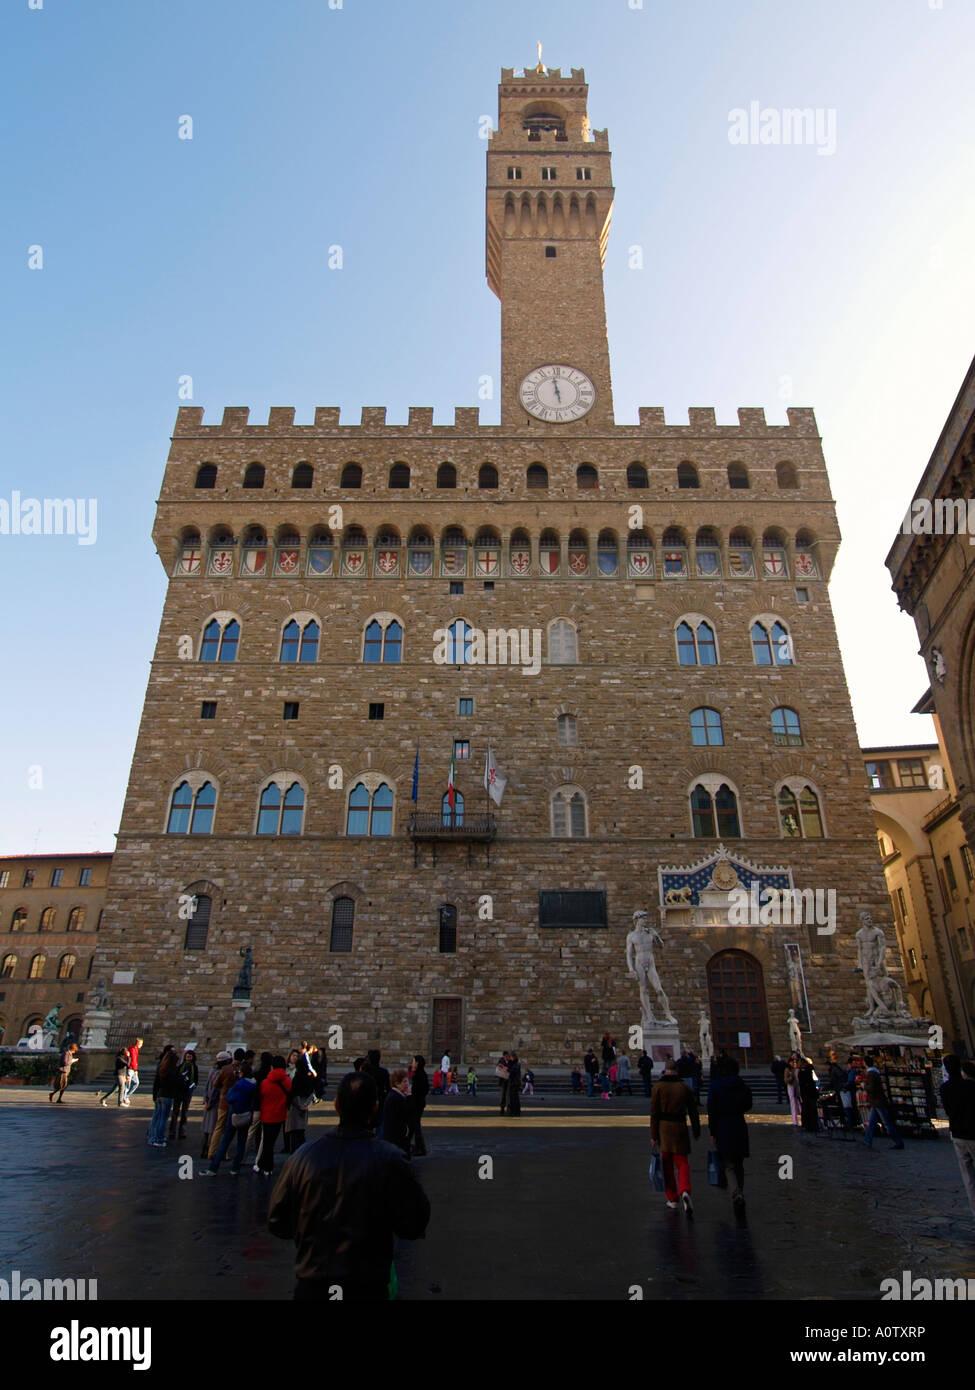 Palazzo Vecchio old palace front view Piazza della Signoria Florence Tuscany Italy Stock Photo